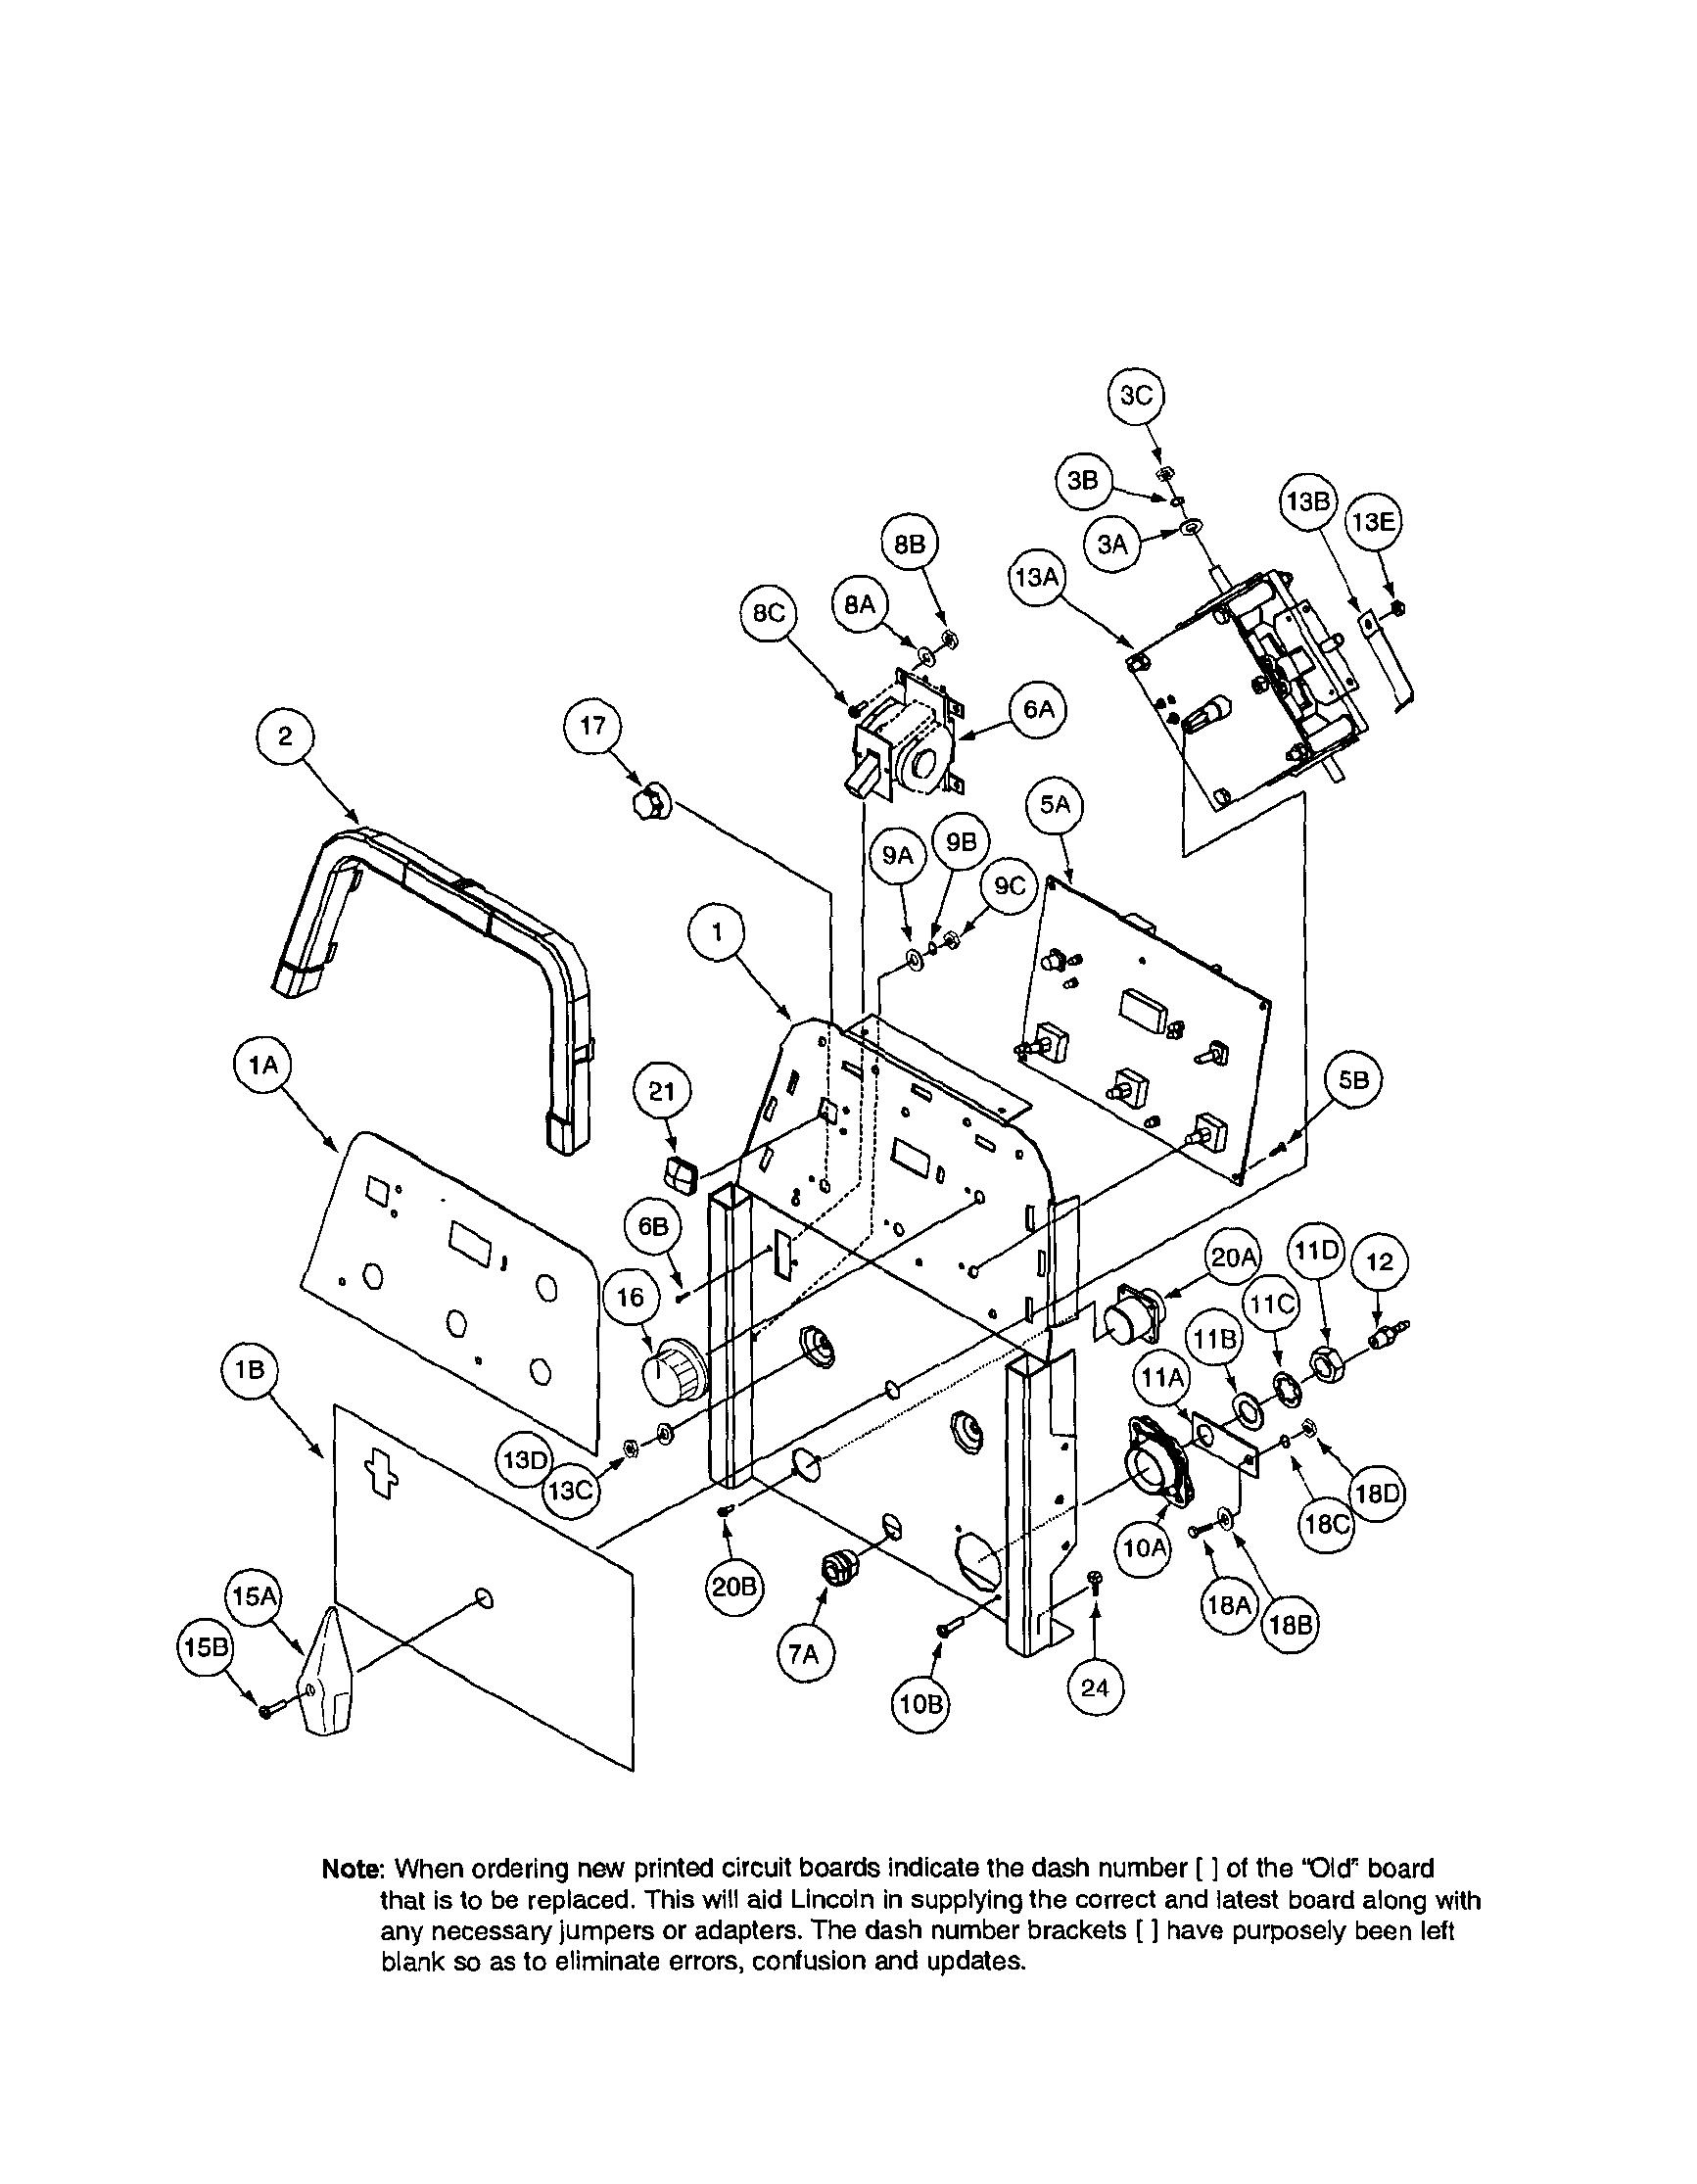 Lincoln Mig Welder Manuals